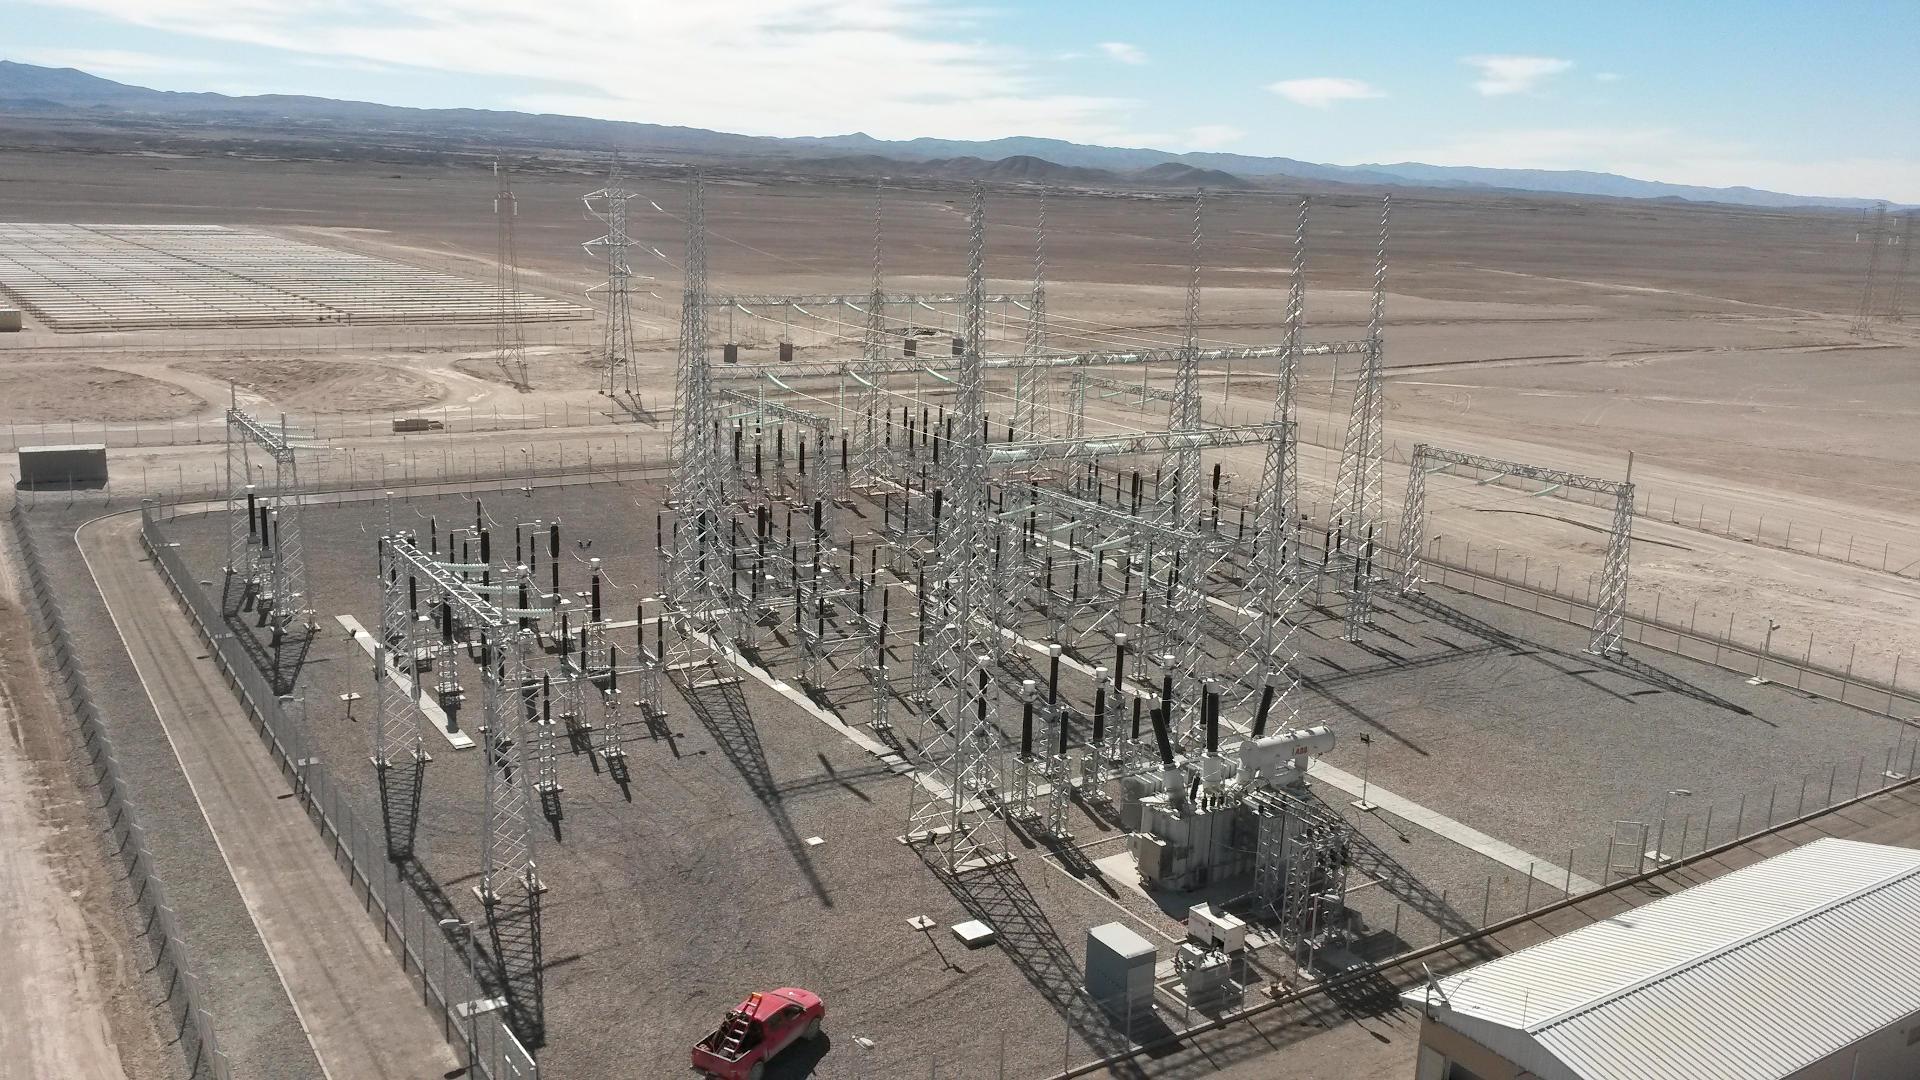 SUBESTACIÓN 220/23 kV PLANTA SOLAR CRUCERO.